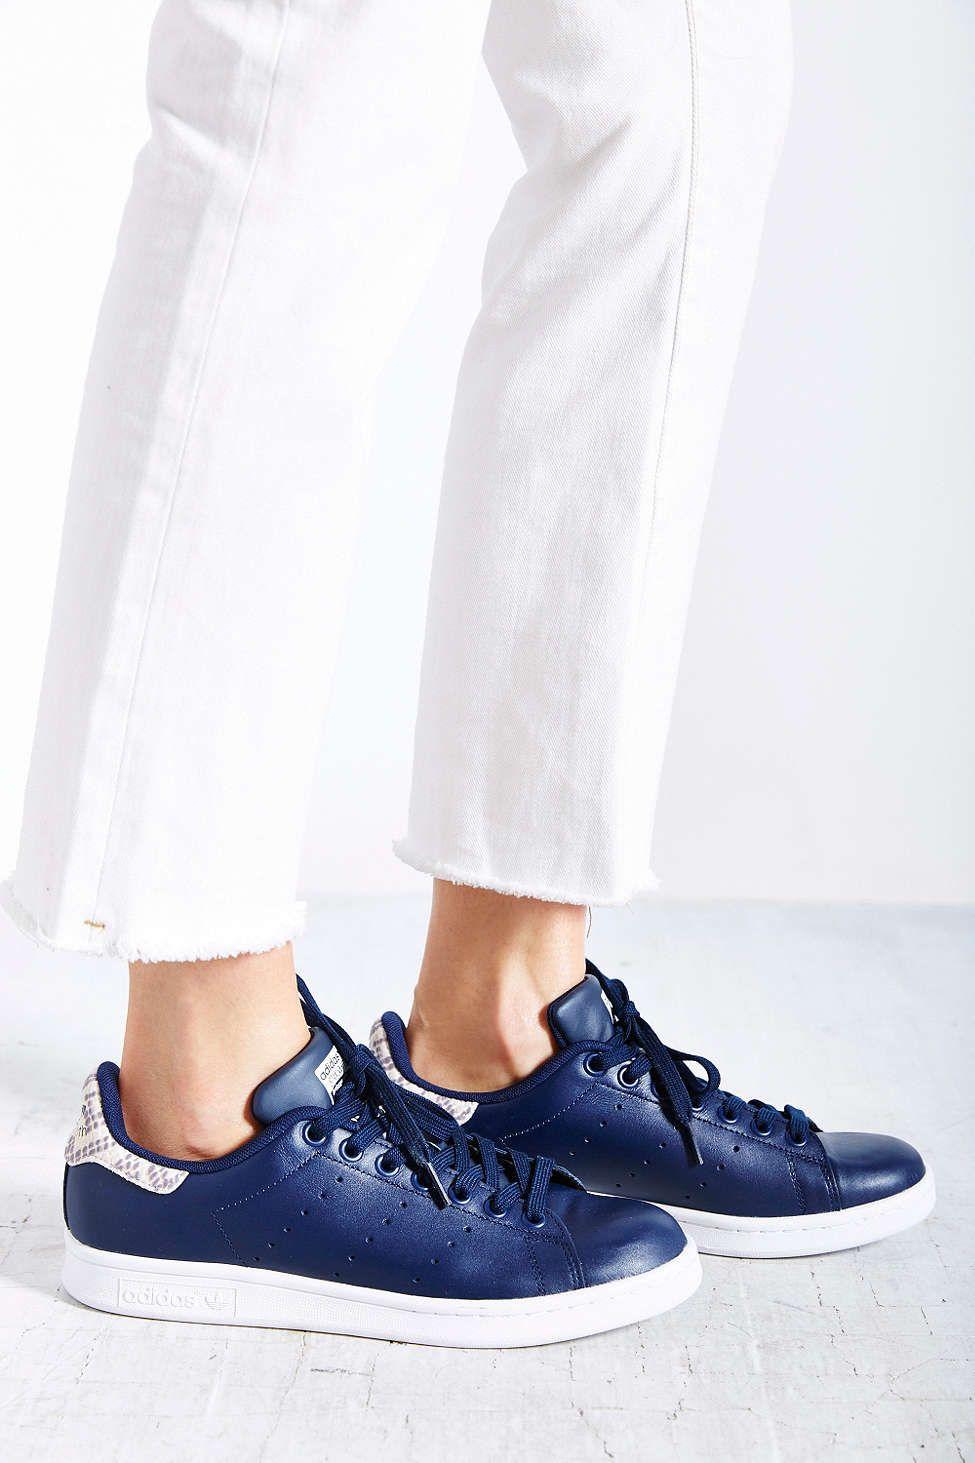 Adidas Originals Stan Smith serpiente zapatilla Siq zapatos Pinterest